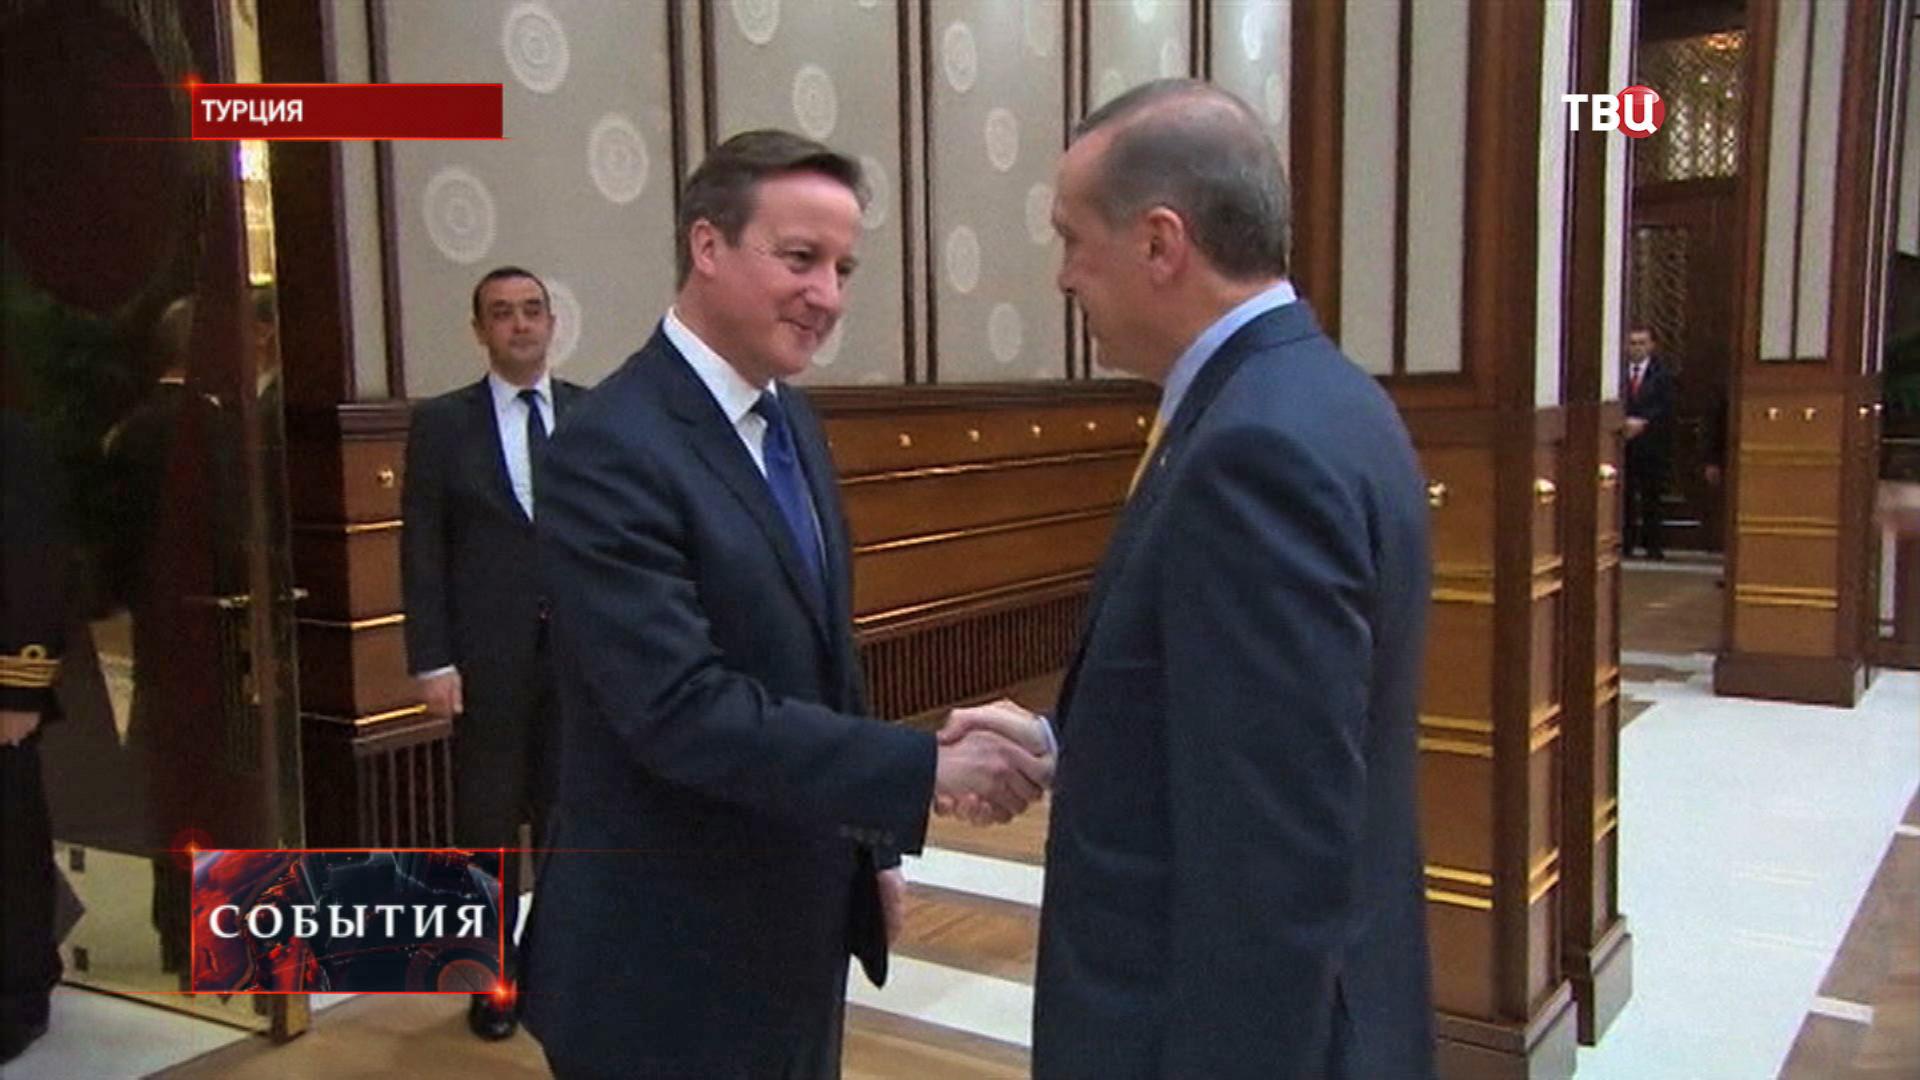 Премьер-министр Великобритании Дэвид Кэмерон и президент Турции Реджеп Тайип Эрдоган